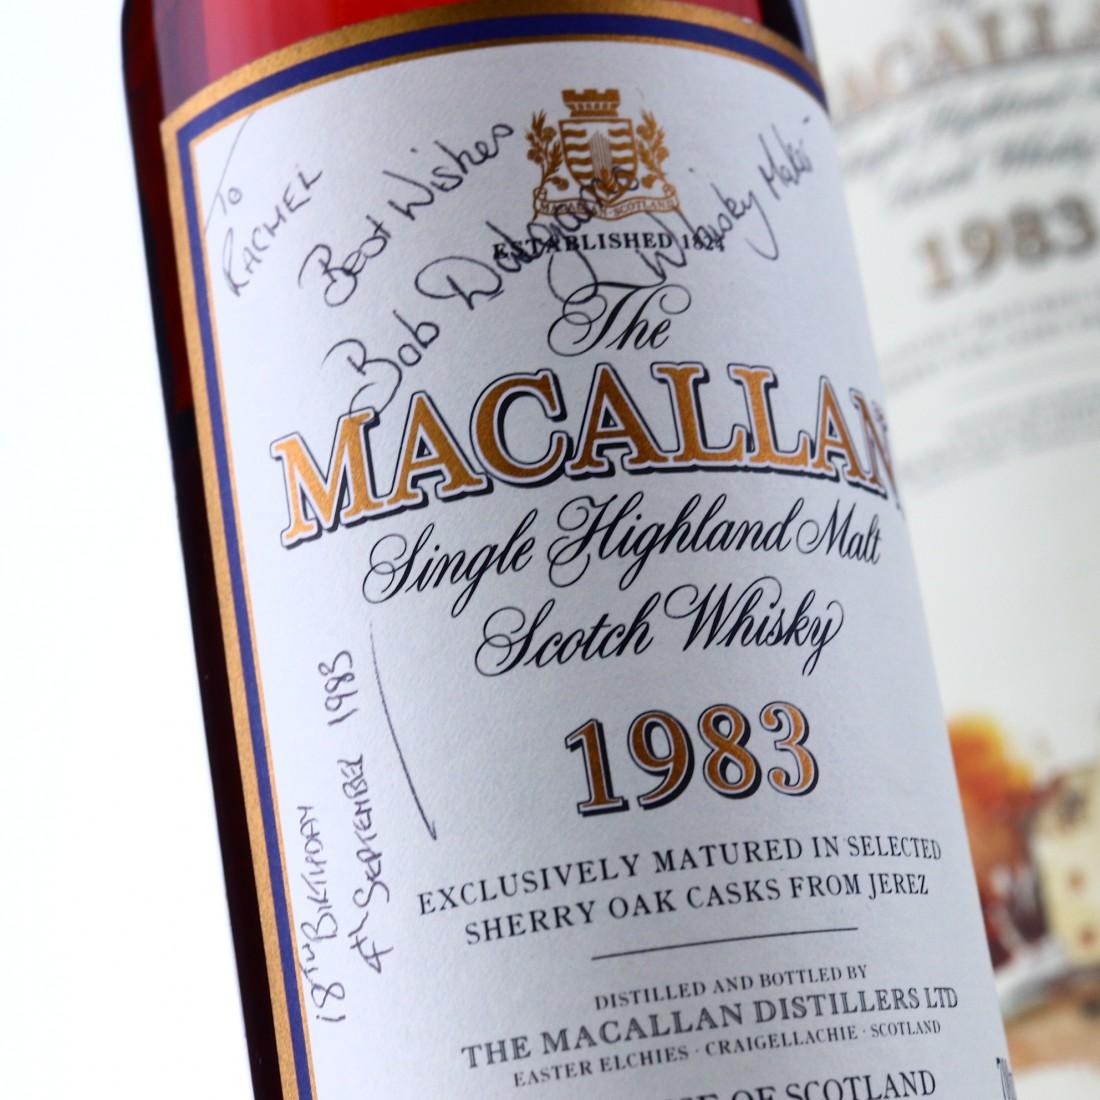 Macallan 1983 18 Year Old / Signed by Bob Dalgarno